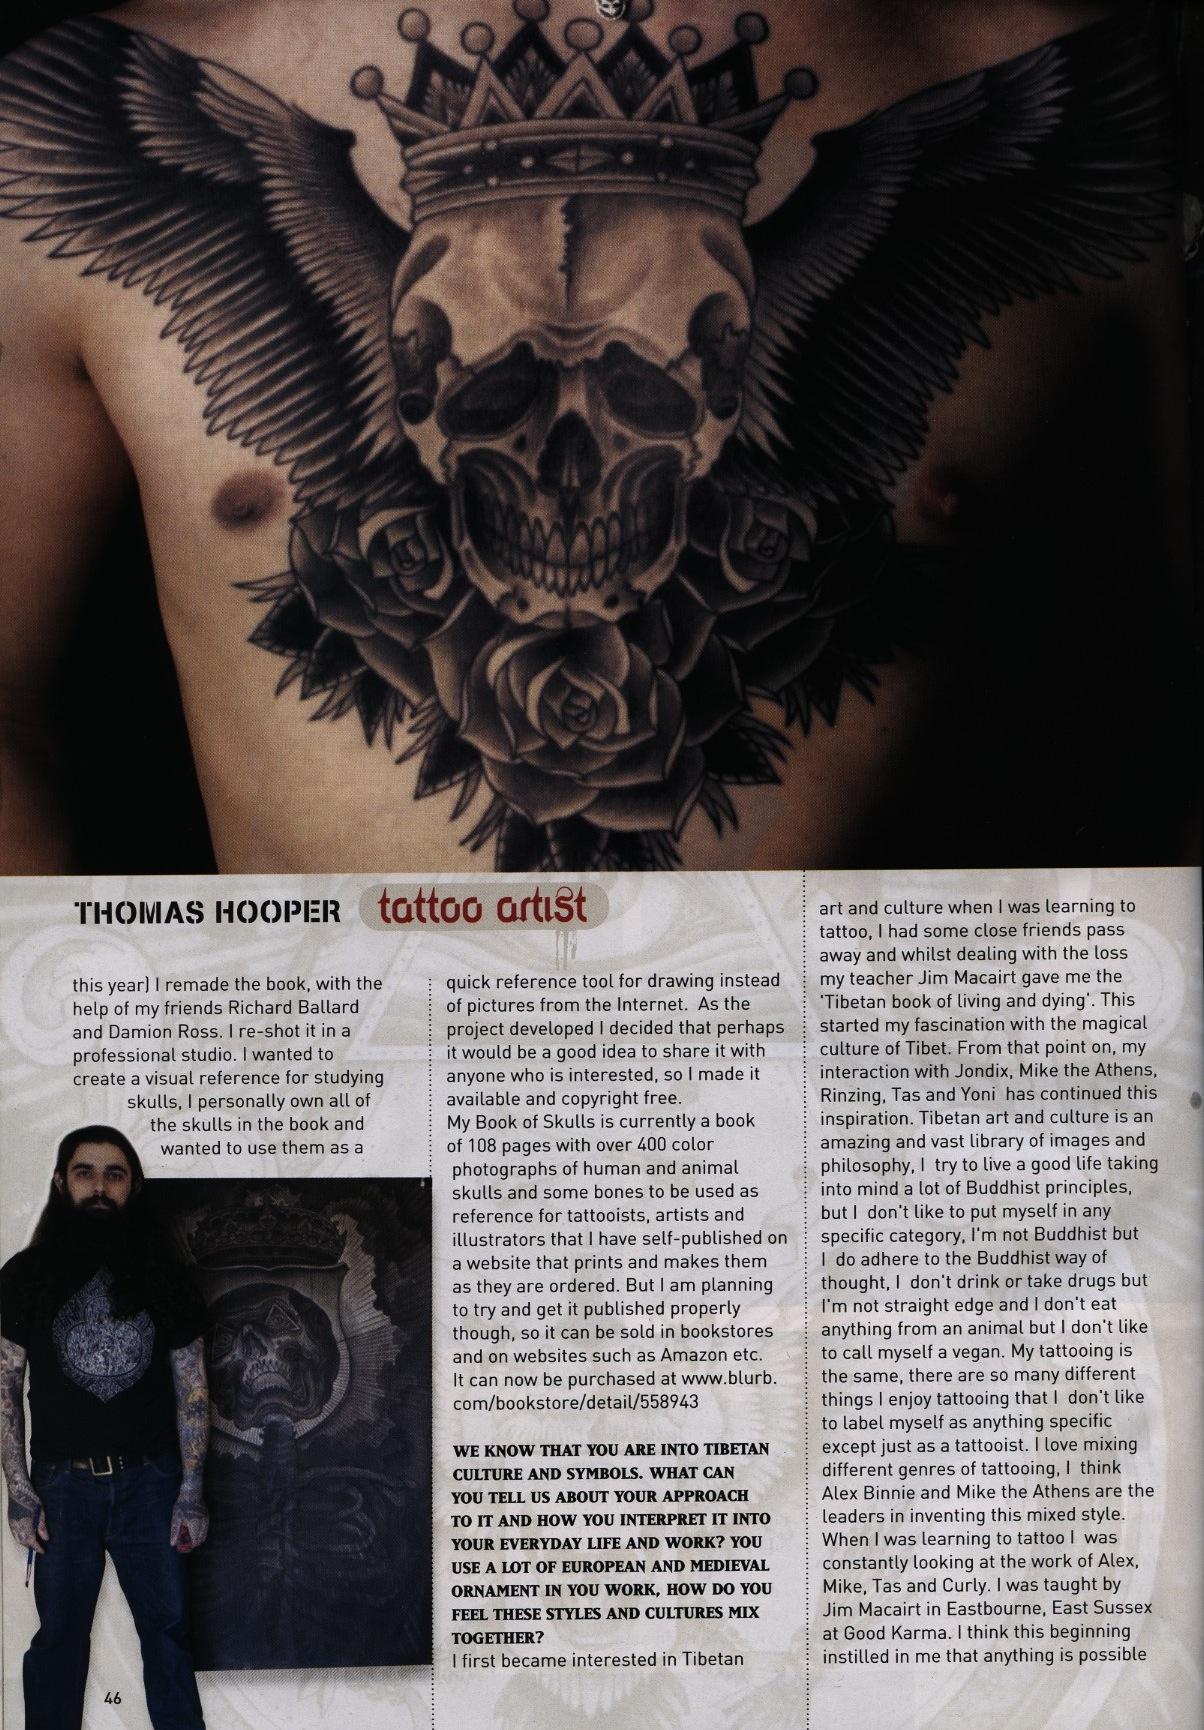 Barcelona tattoo show 2008 -